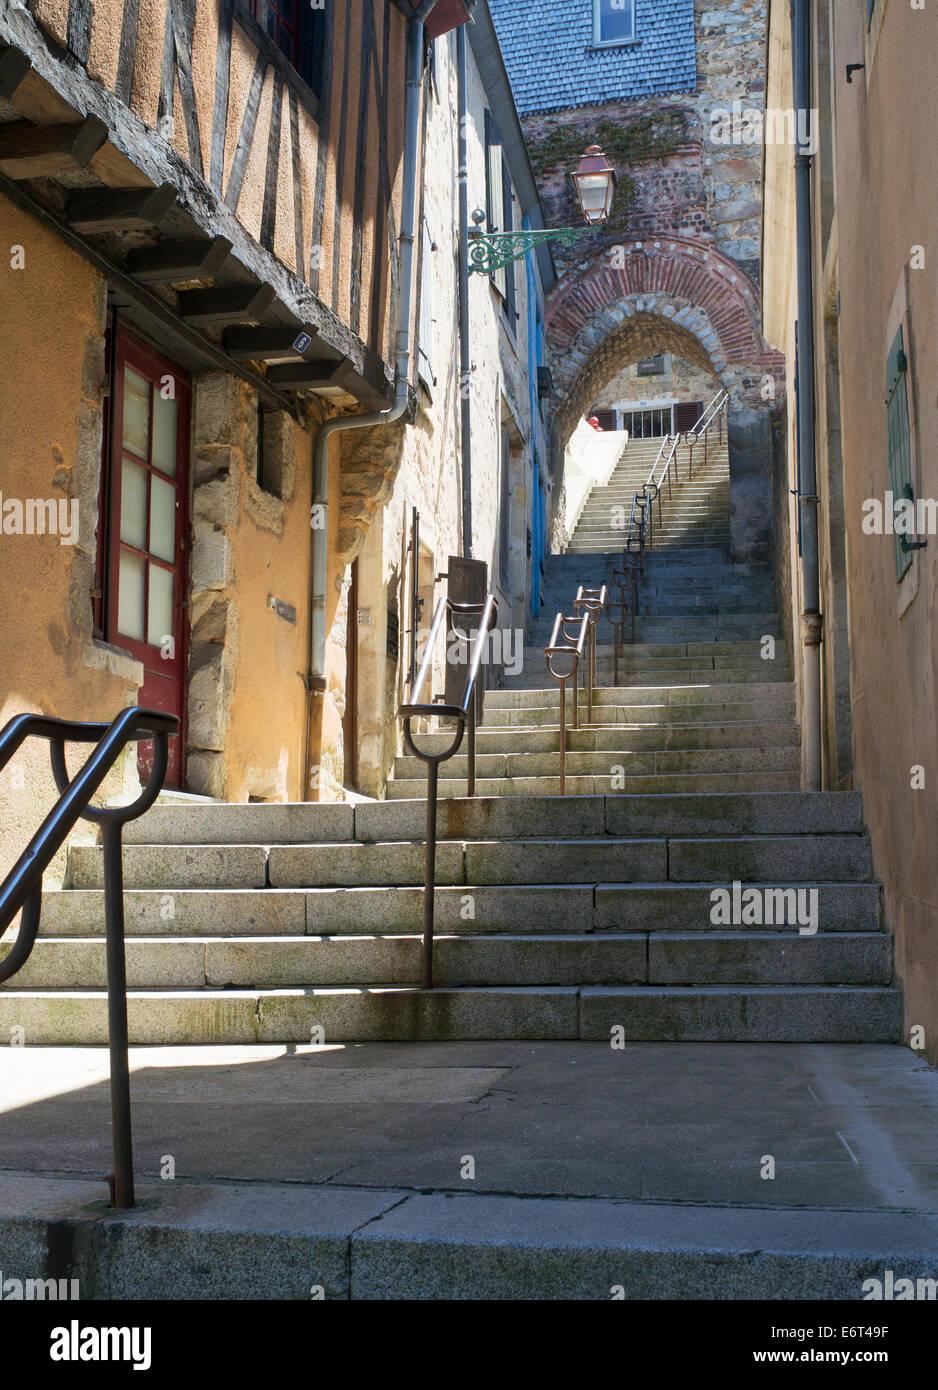 Old stone stairway L'escalier de grande poterne, Le Mans, France, Europe Stock Photo